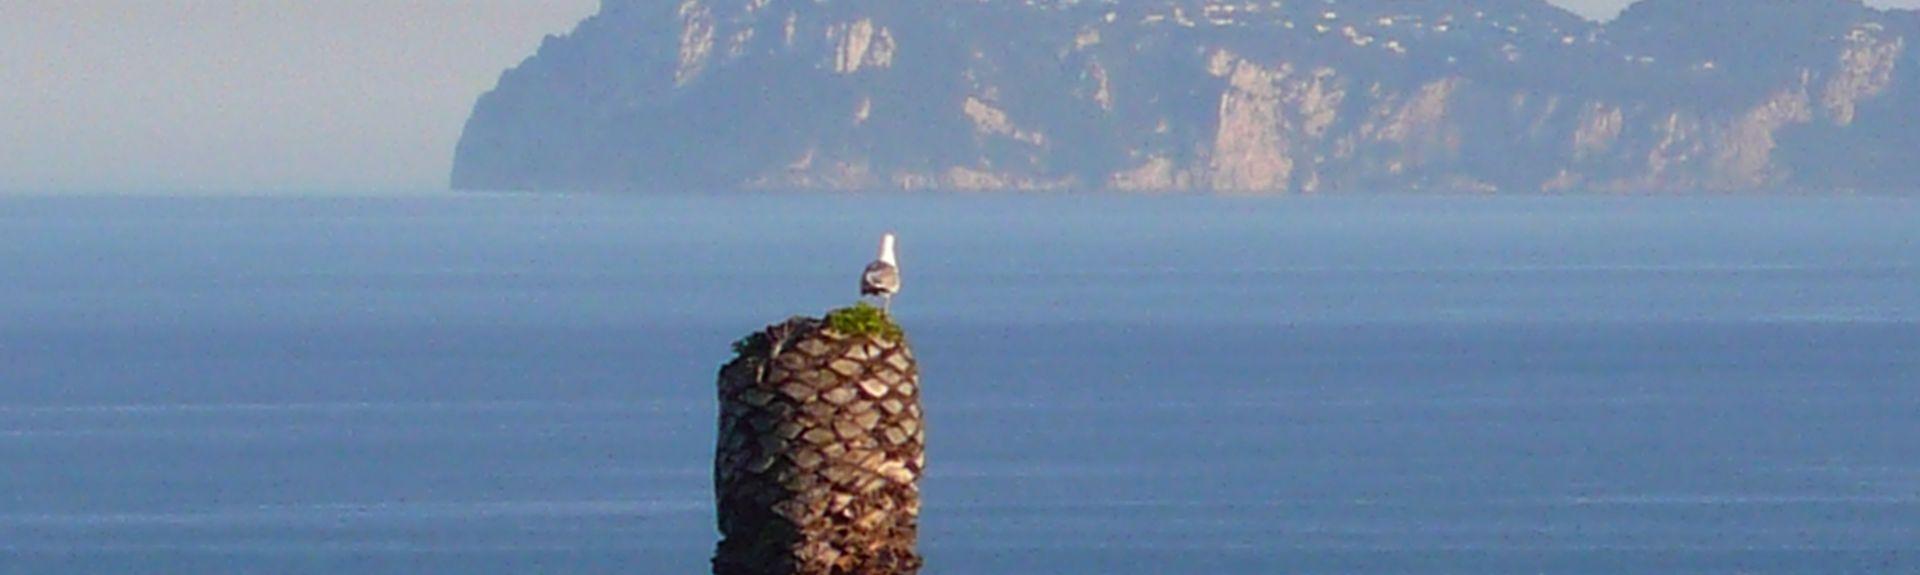 Fuorigrotta, Napels, Campania, Italië